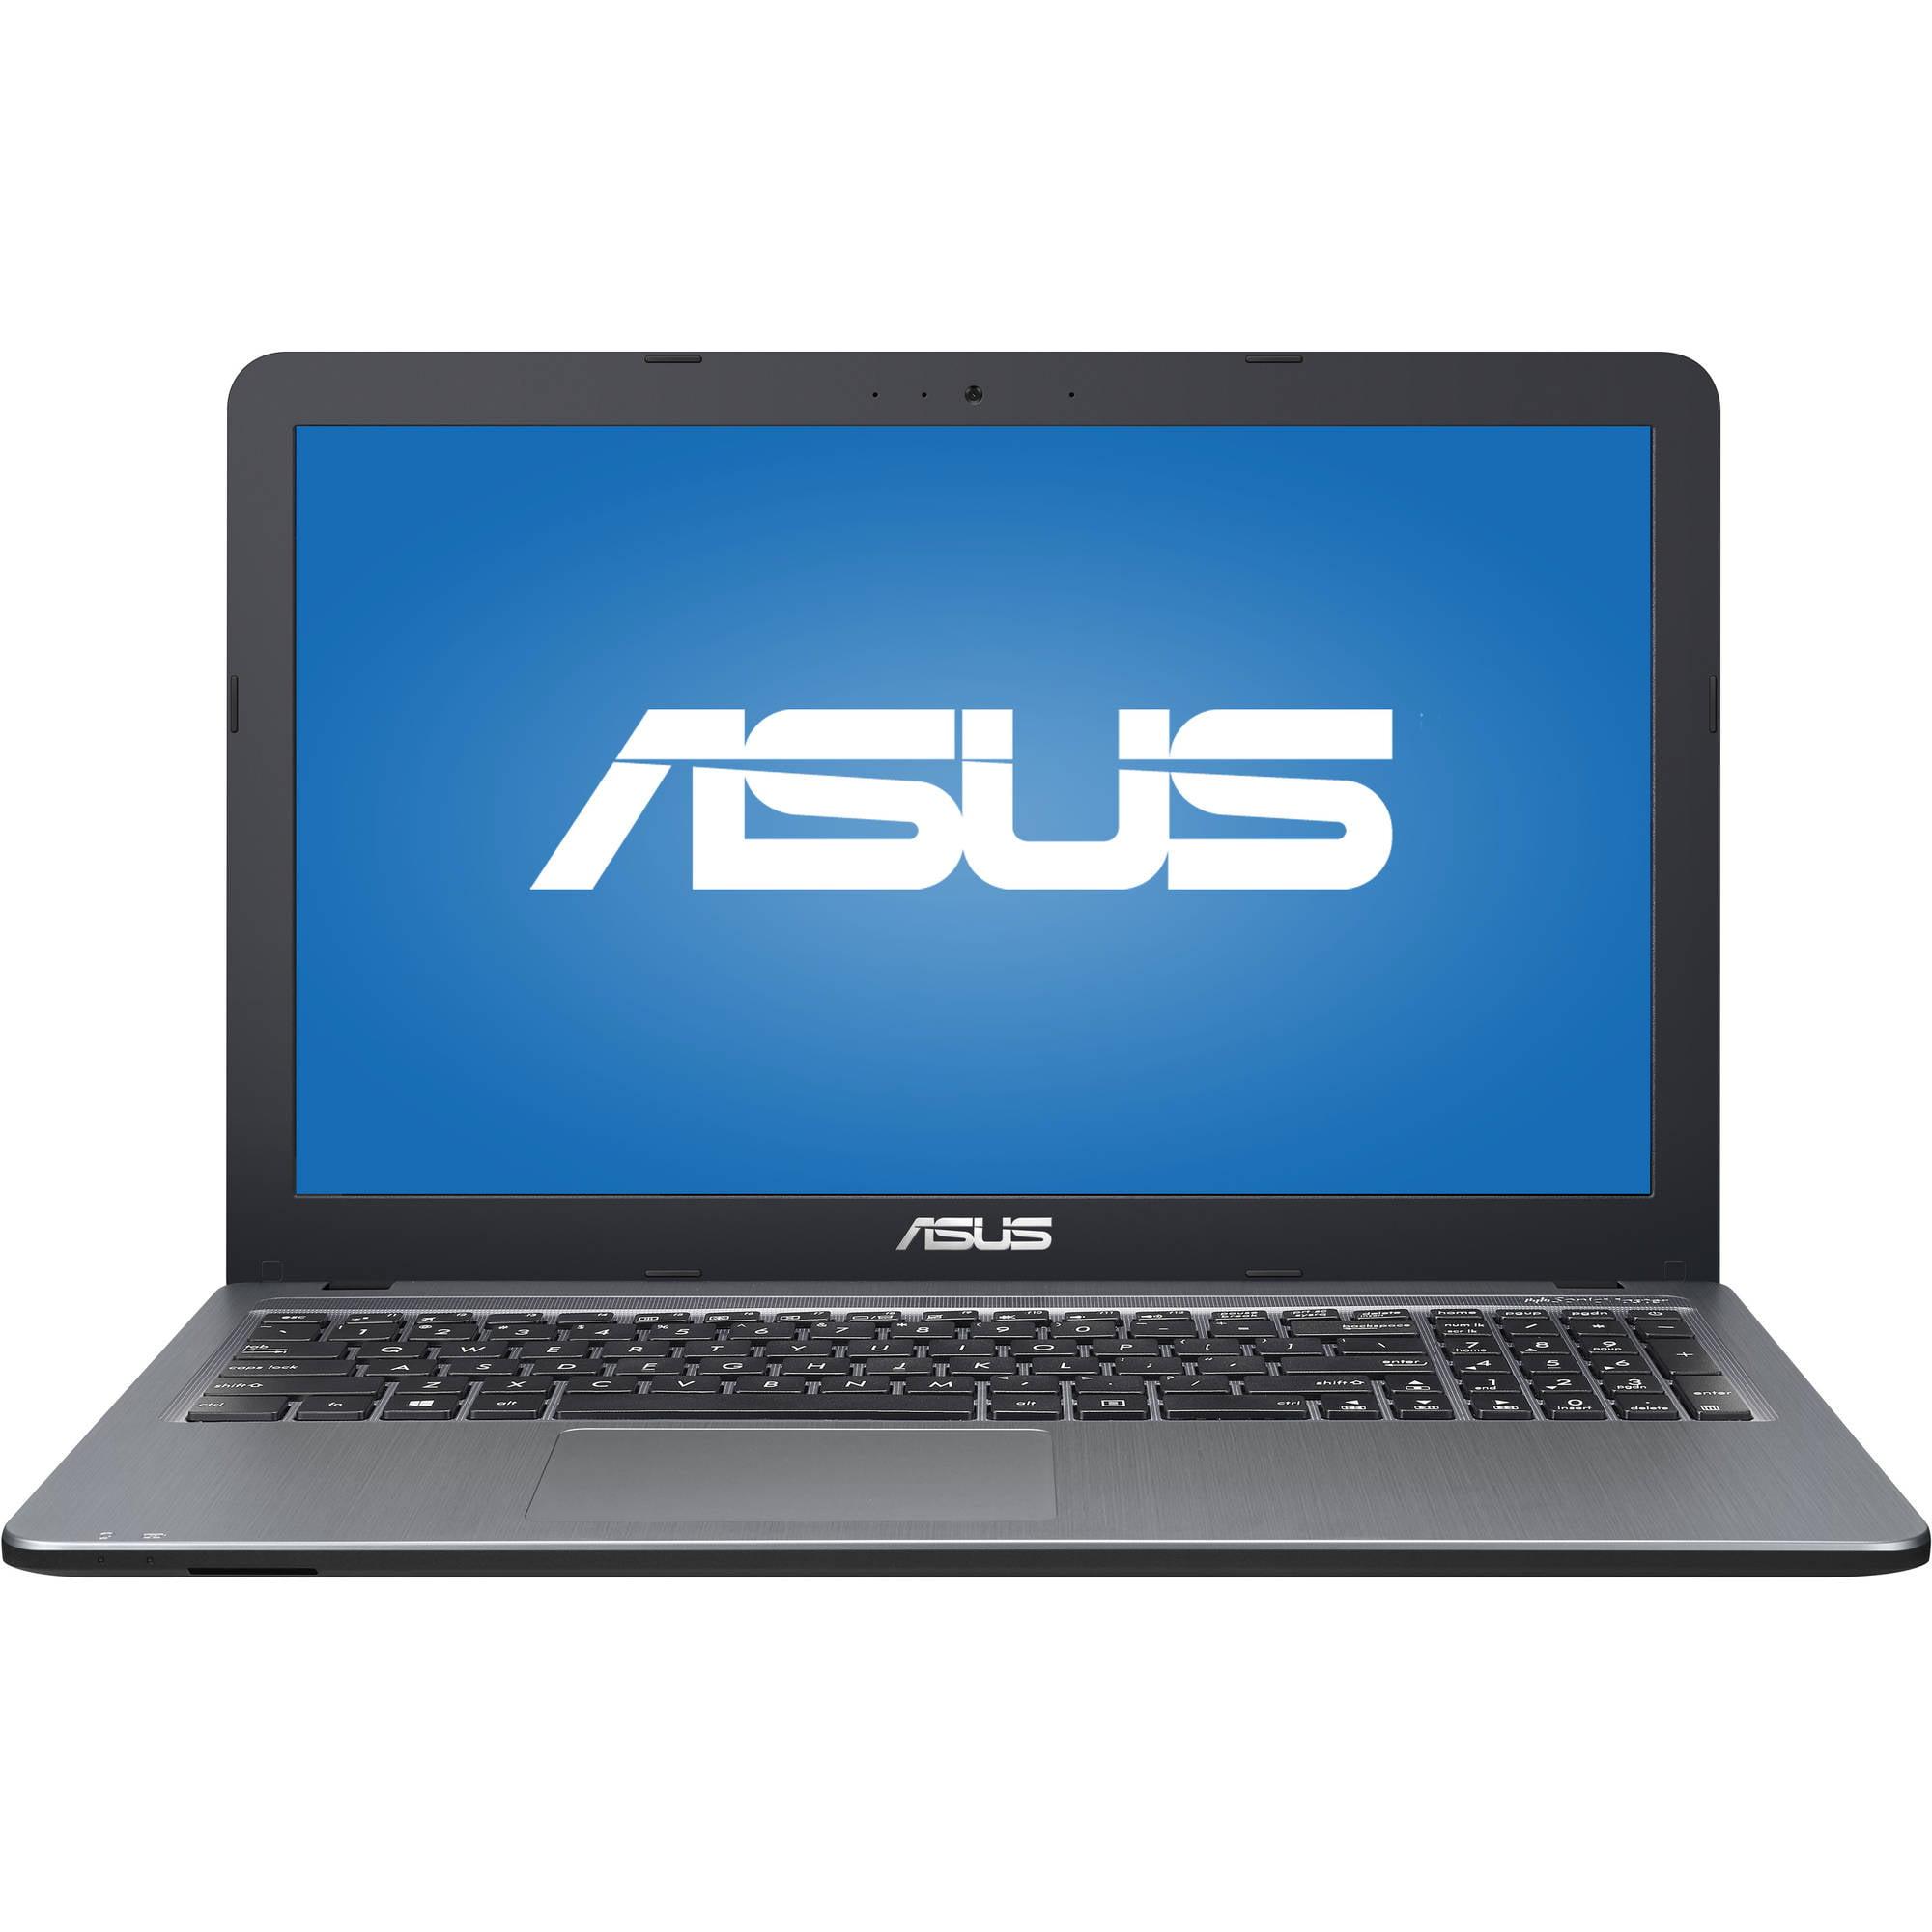 asus laptop windows 7 professional